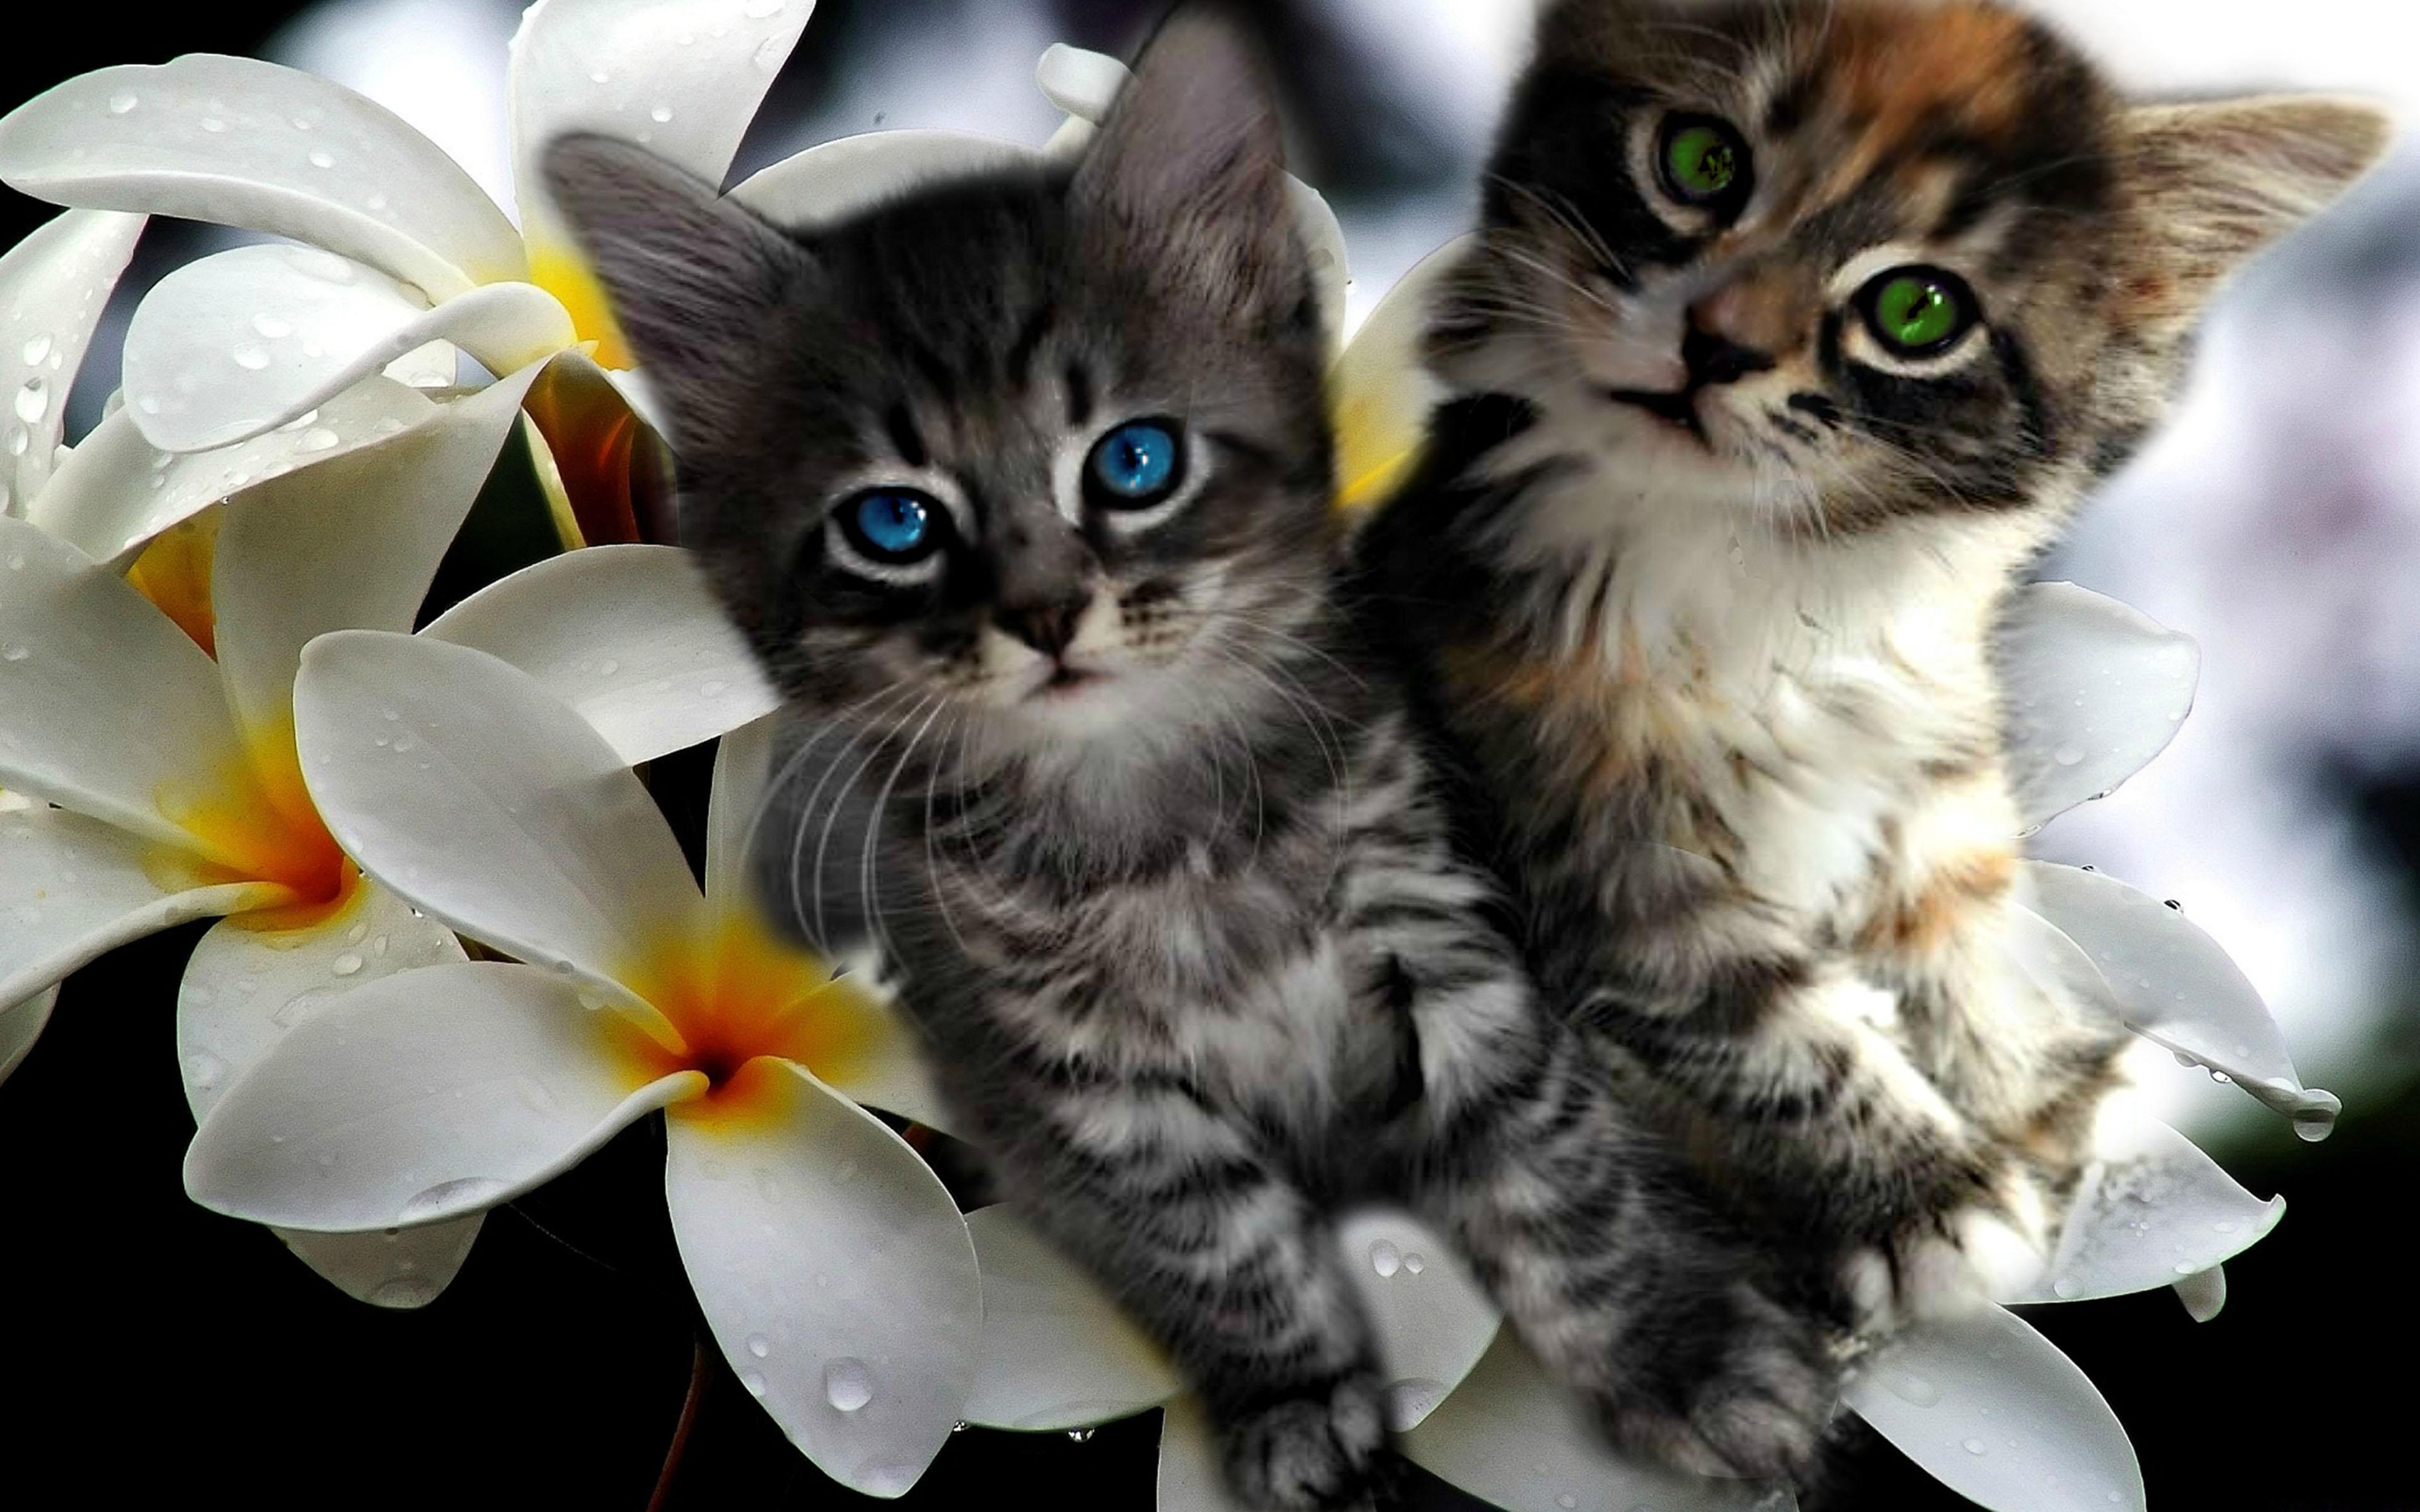 Free Cute Christmas Desktop Wallpaper Kittens Plumeria For Desktop Background Widescreen